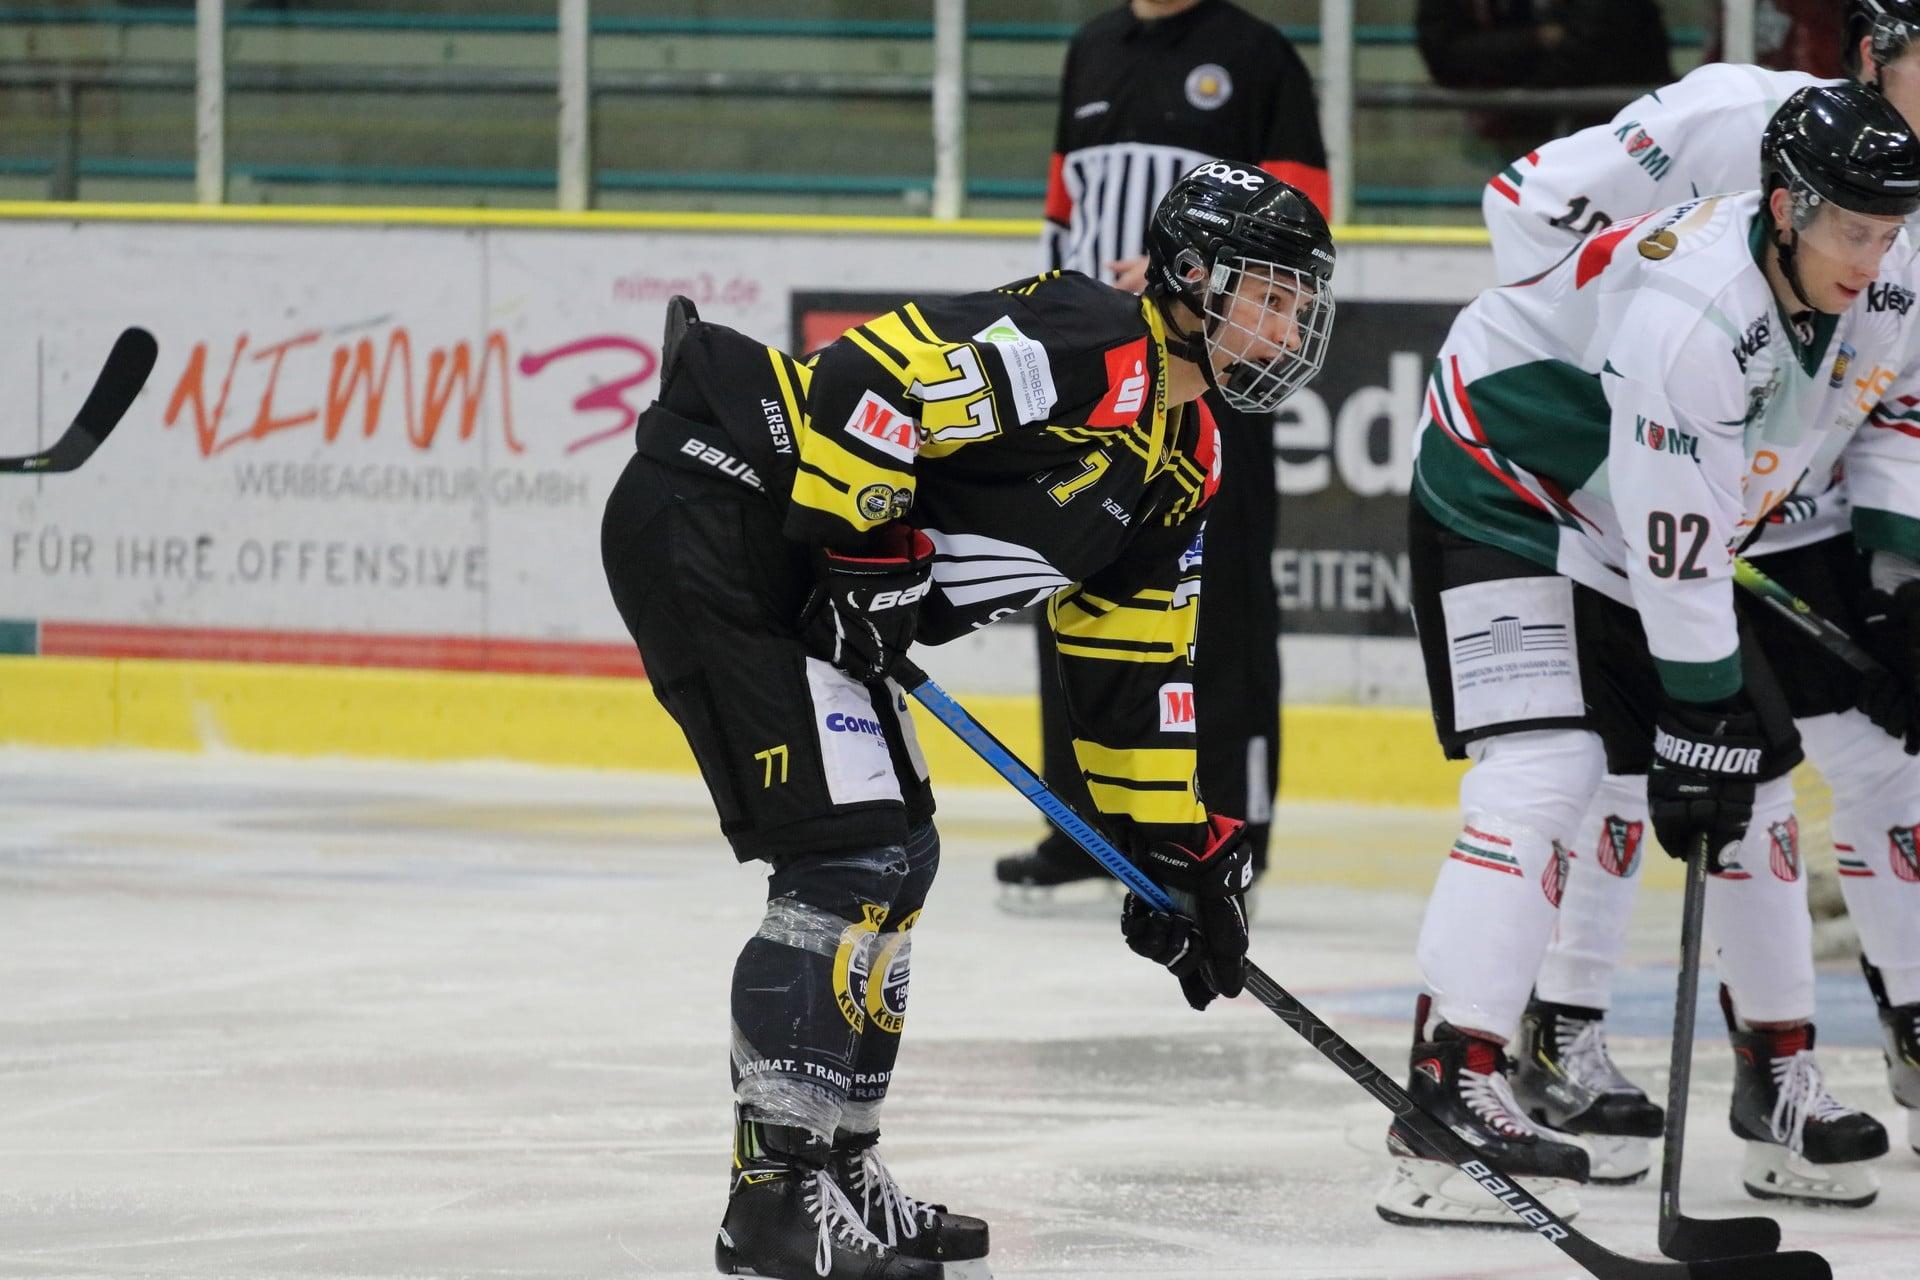 Tabelle Oberliga Eishockey